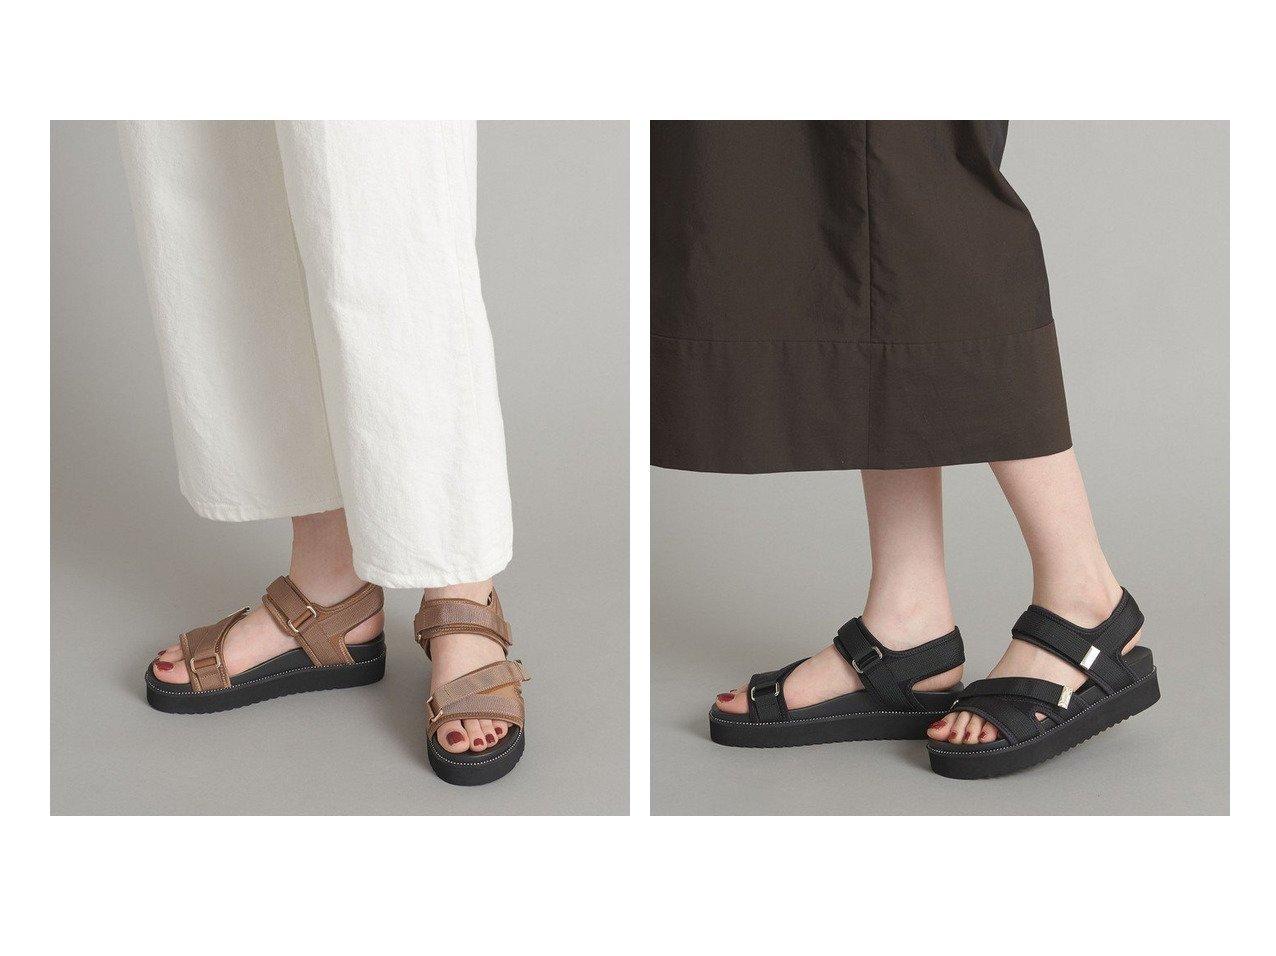 【Odette e Odile/オデット エ オディール】のOFC ベルトスポーツ サンダル25 【シューズ・靴】おすすめ!人気、トレンド・レディースファッションの通販 おすすめで人気の流行・トレンド、ファッションの通販商品 インテリア・家具・メンズファッション・キッズファッション・レディースファッション・服の通販 founy(ファニー) https://founy.com/ ファッション Fashion レディースファッション WOMEN ベルト Belts スポーツウェア Sportswear サンダル / ミュール Sandals スポーツ シューズ Shoes サンダル シューズ スポーツ  ID:crp329100000054582